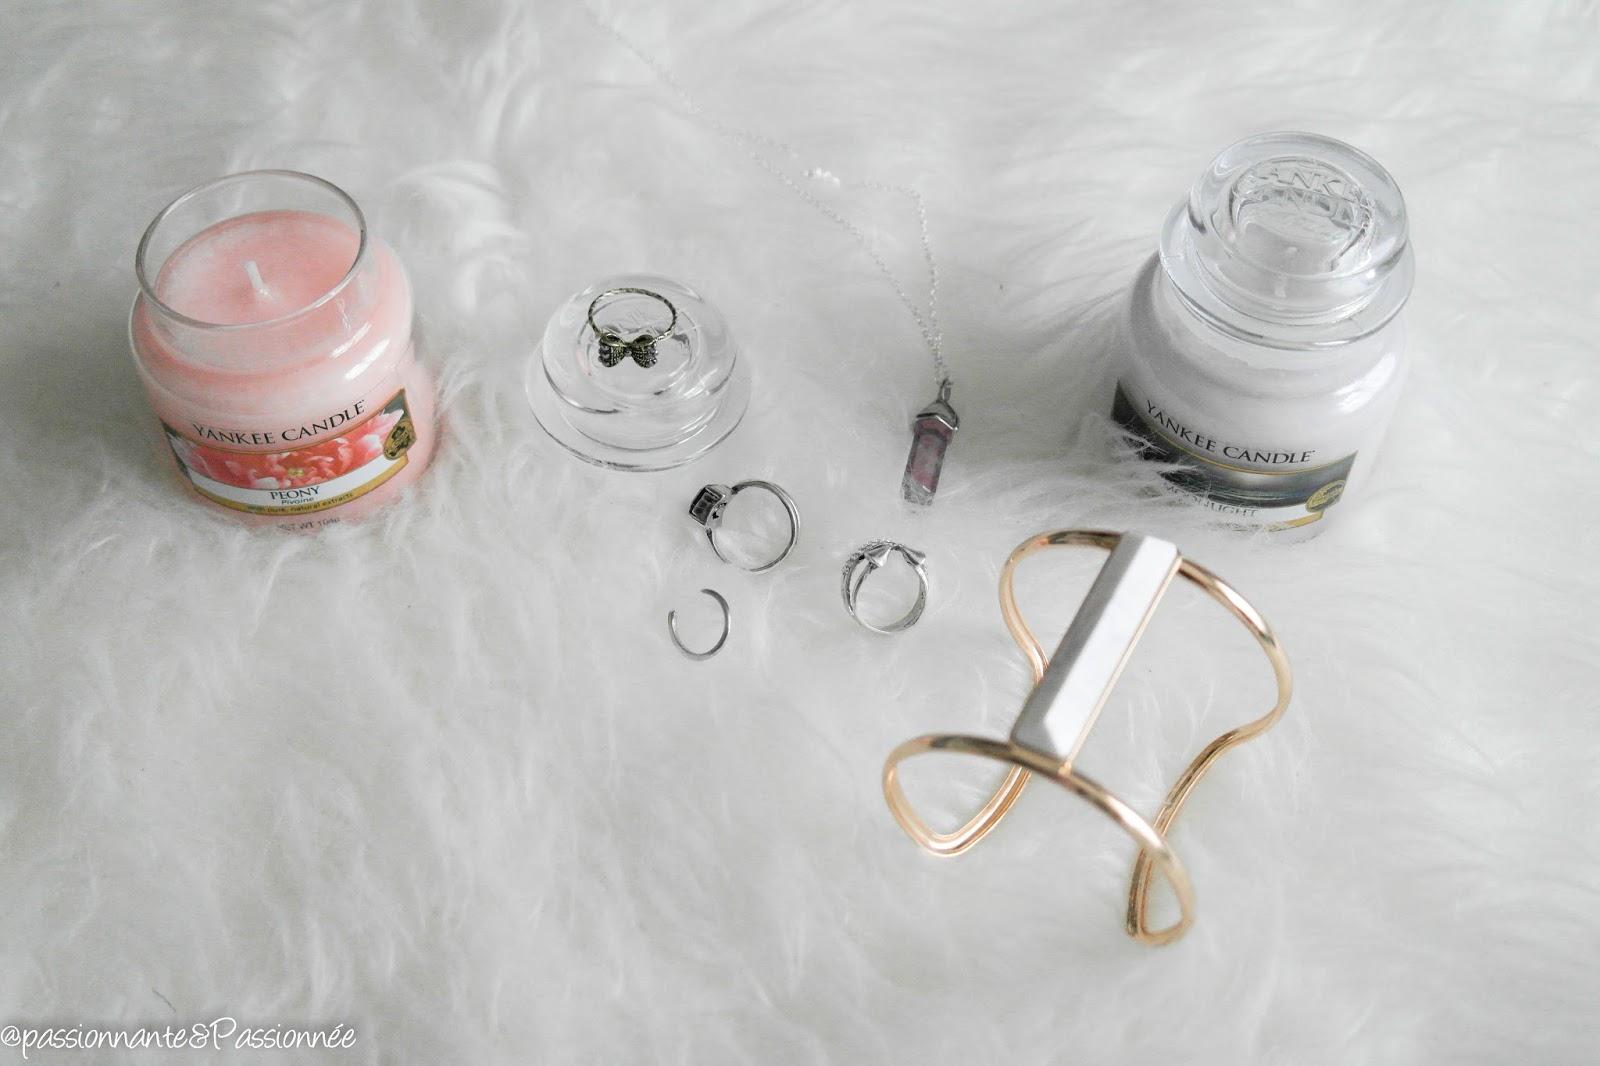 bijoux néejolie